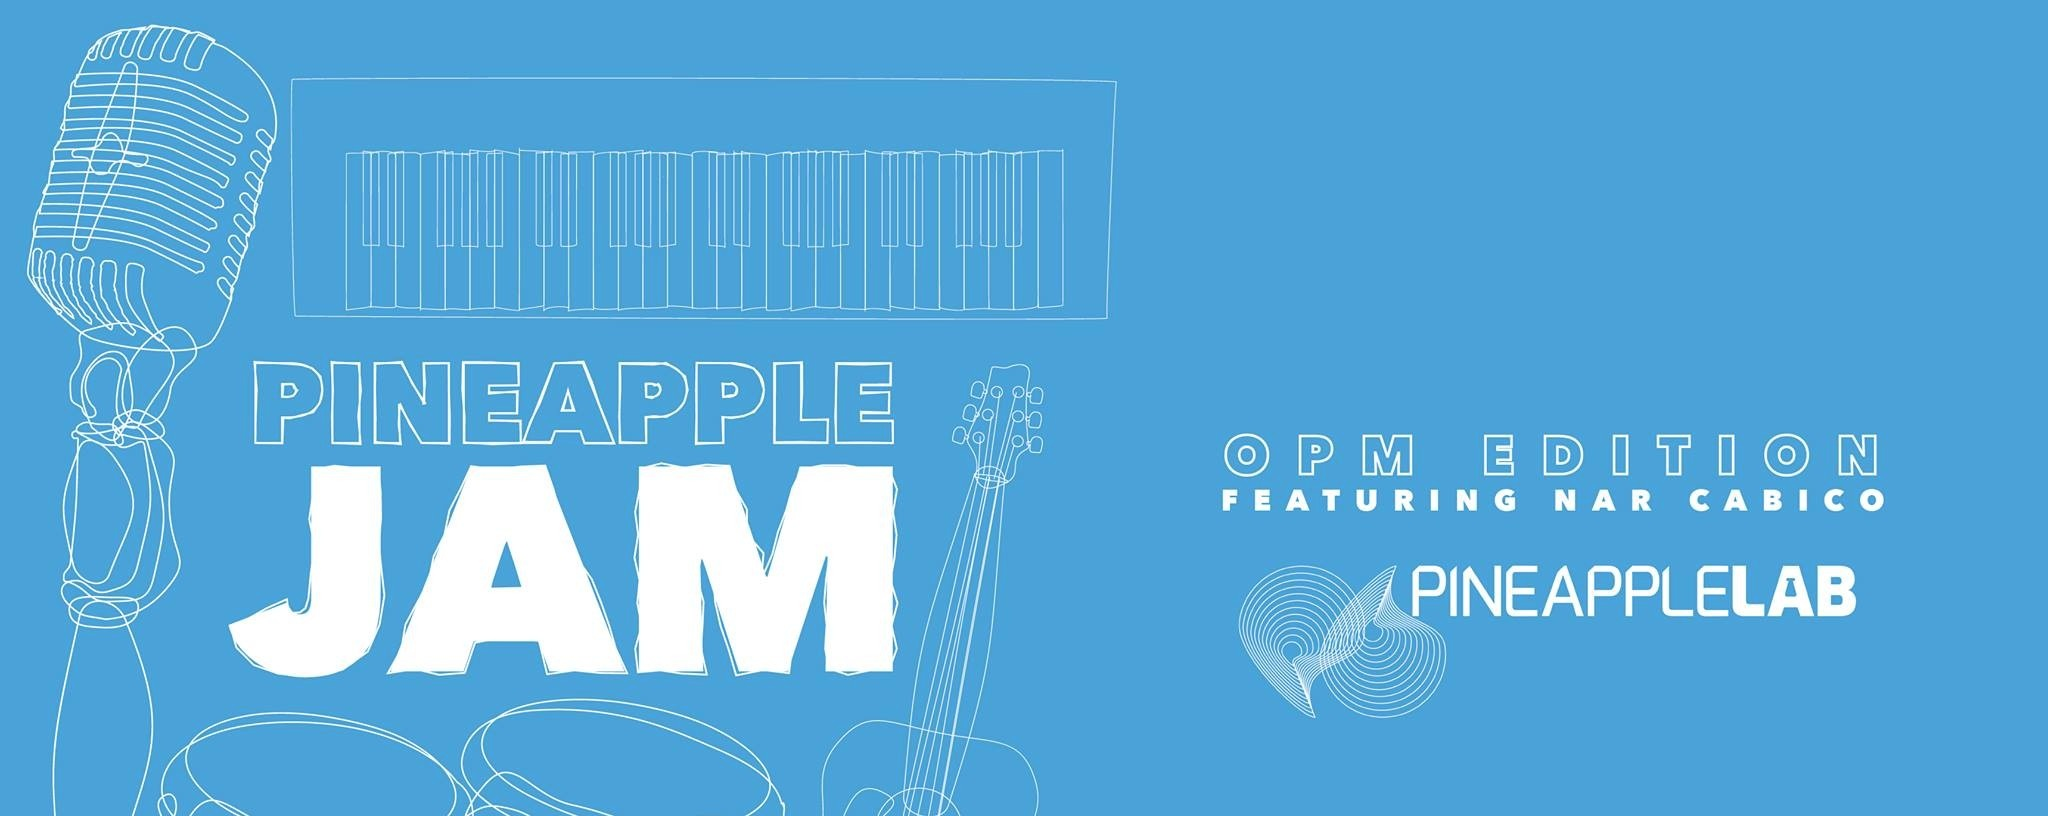 Pineapple Jam OPM Edition!